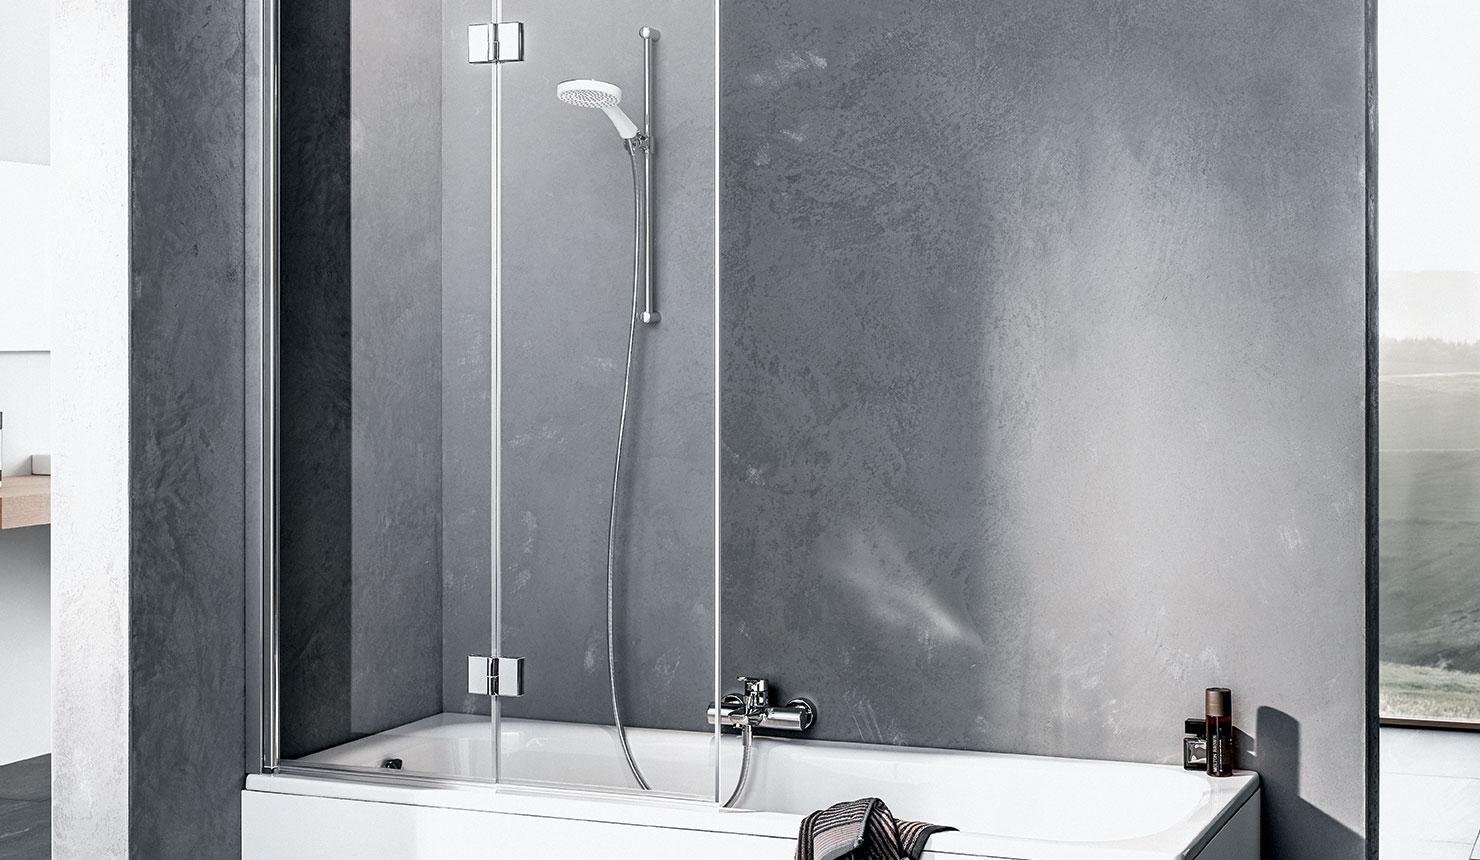 Vasca Da Bagno Misure Standard paraspruzzi per vasche da bagno: il comfort kermi per tutti